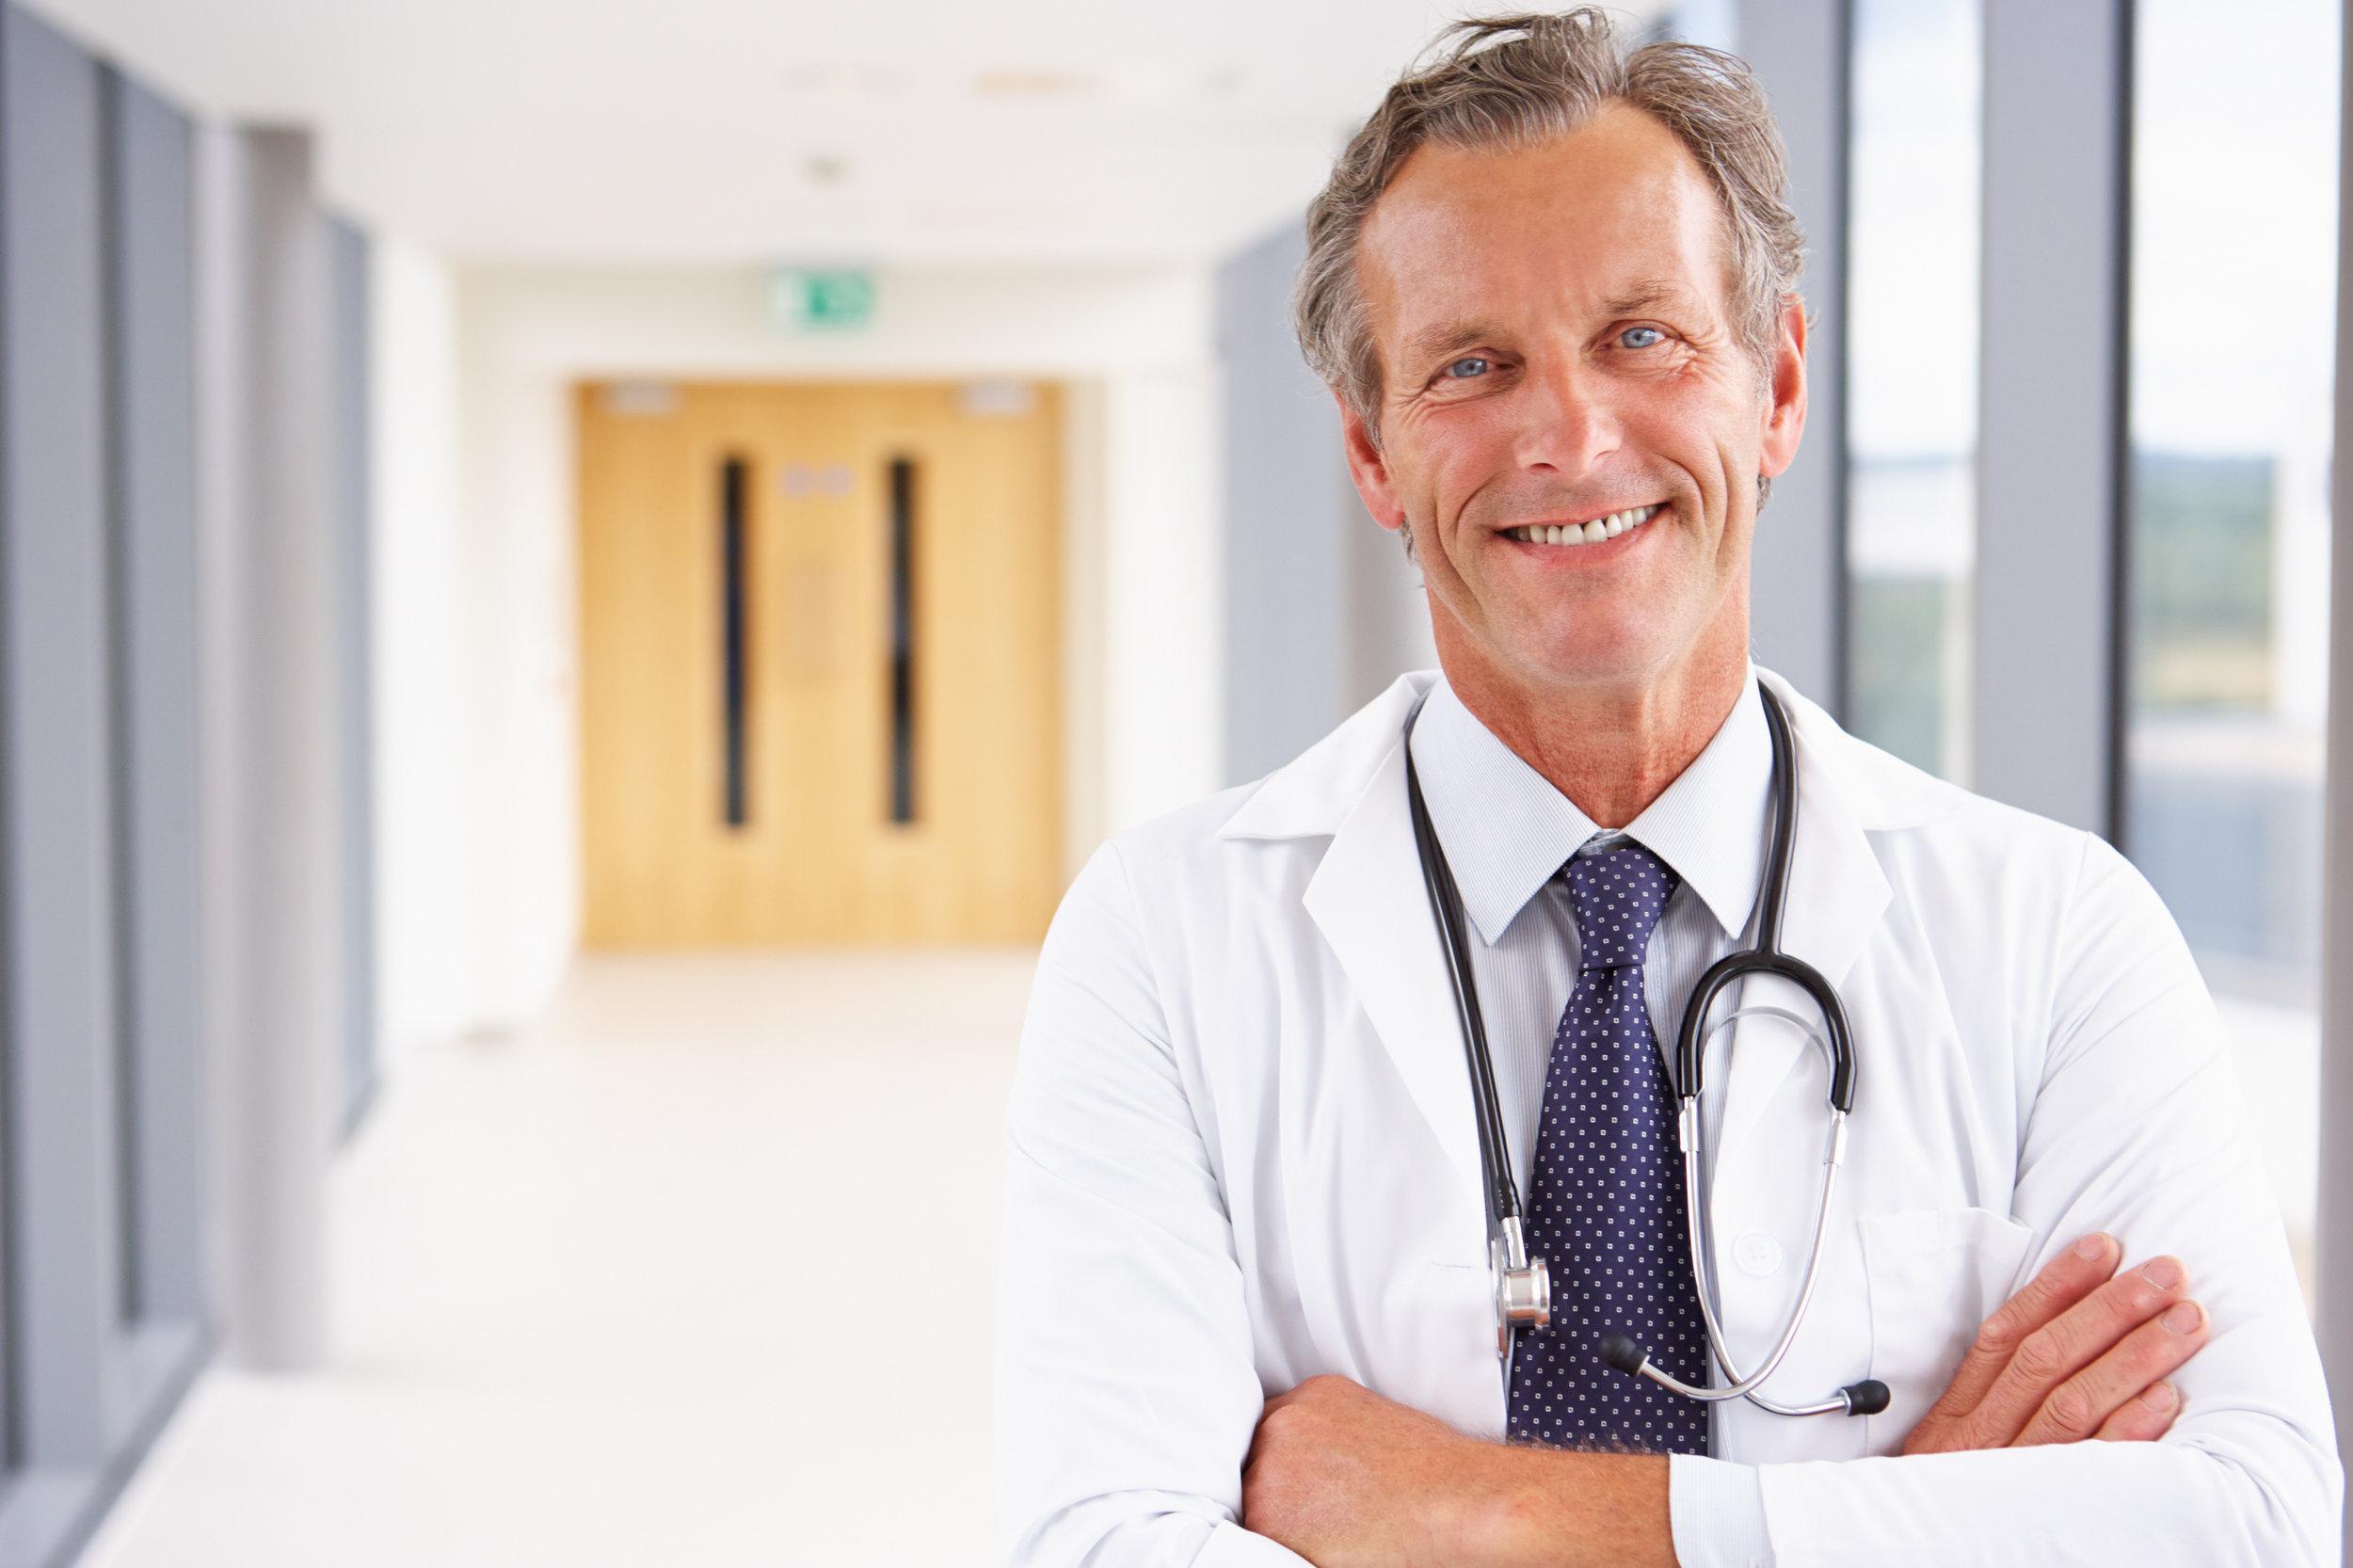 Smiling Doctor in Hospital.jpeg